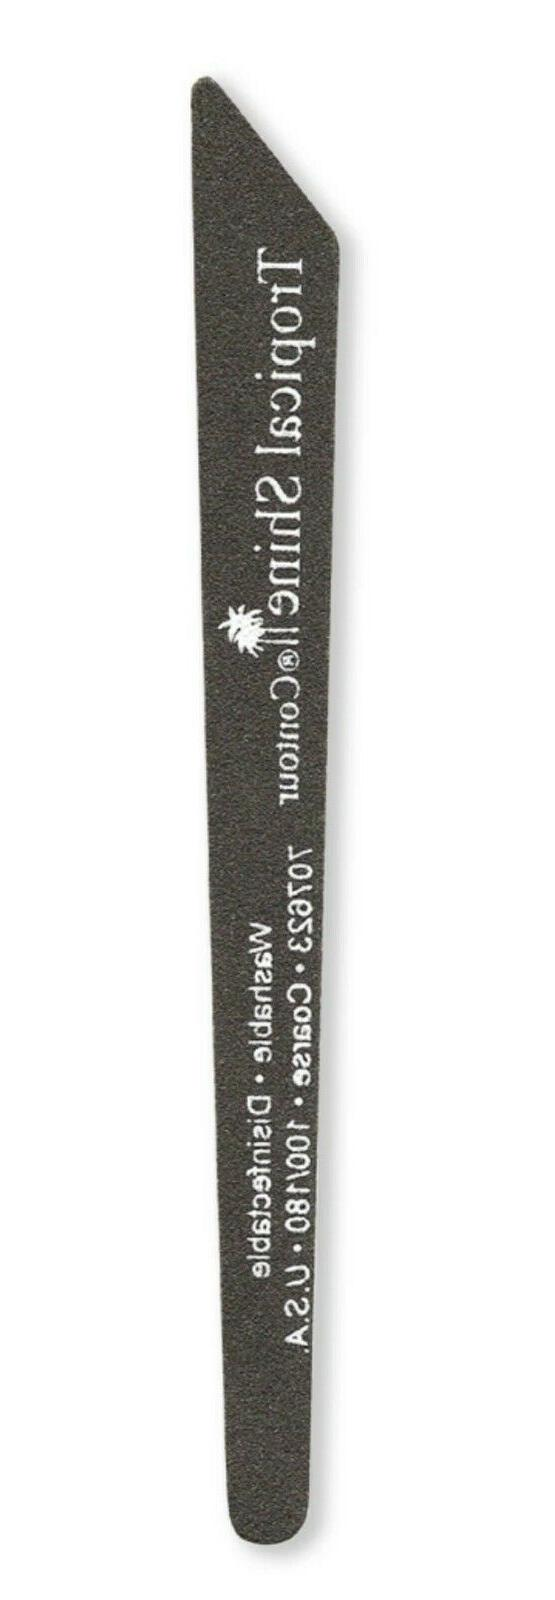 Tropical Long Lasting Black Contour Nail File Coarse Medium grit